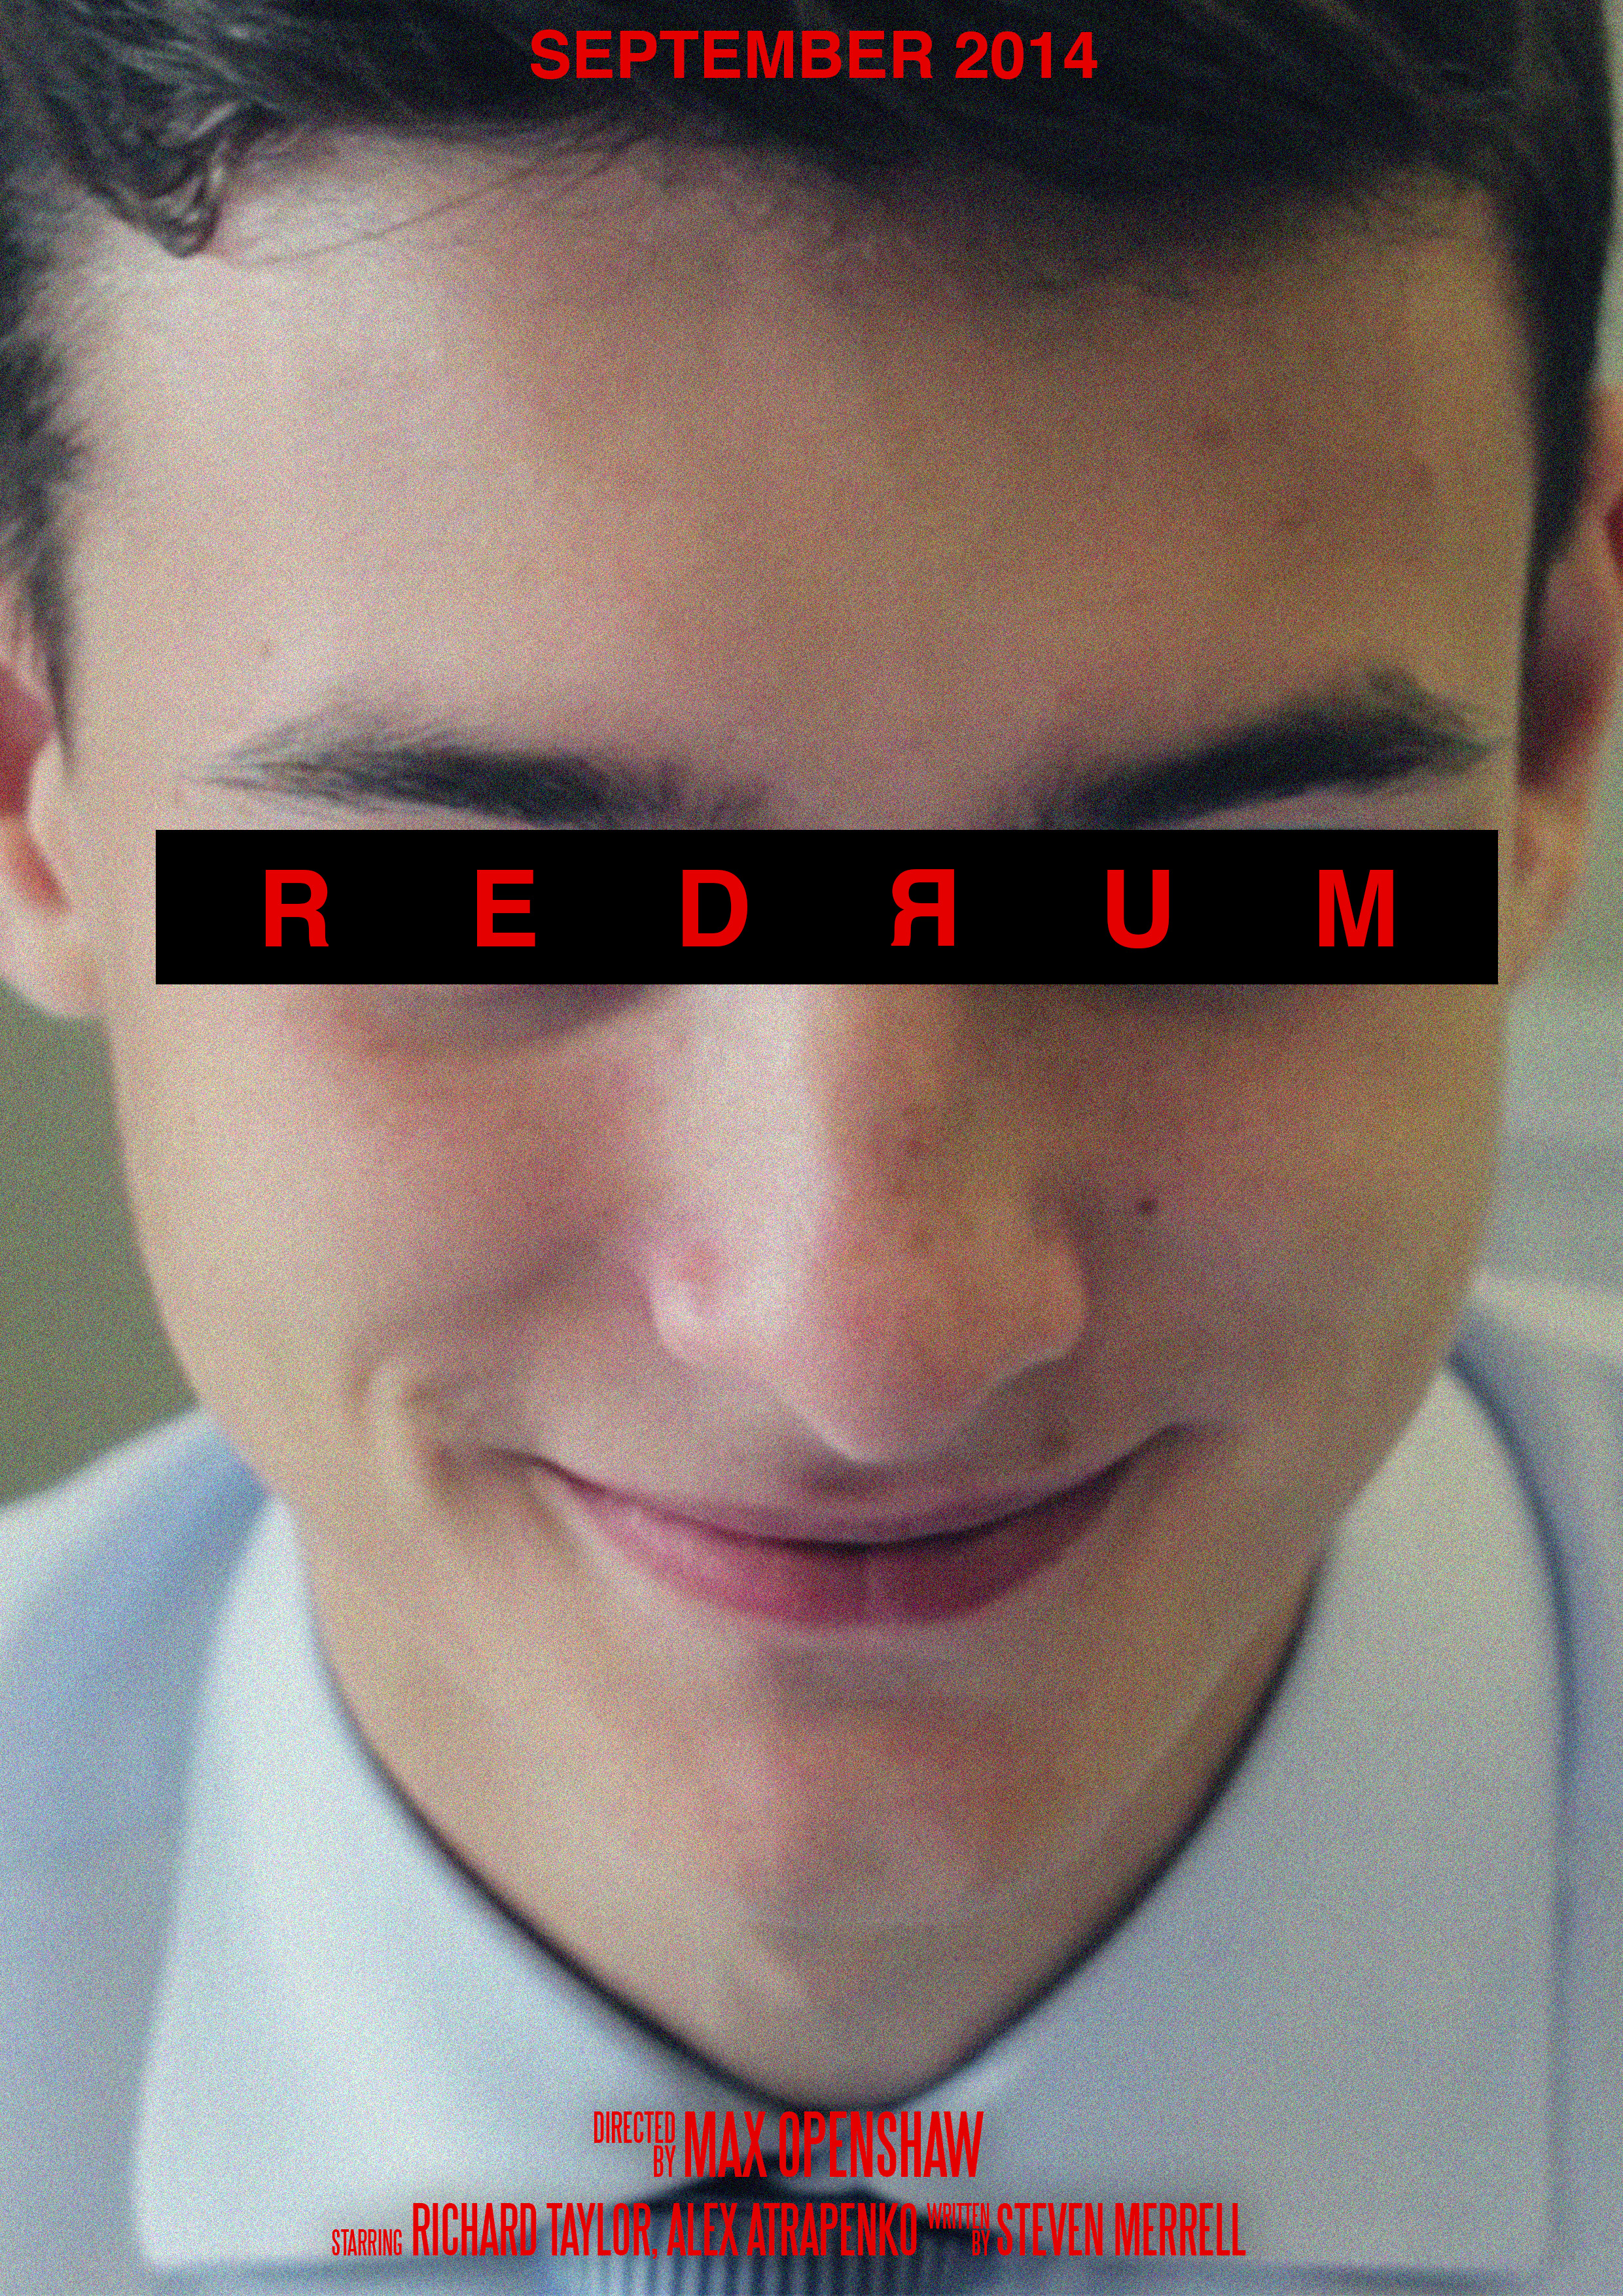 REDRUM.jpg